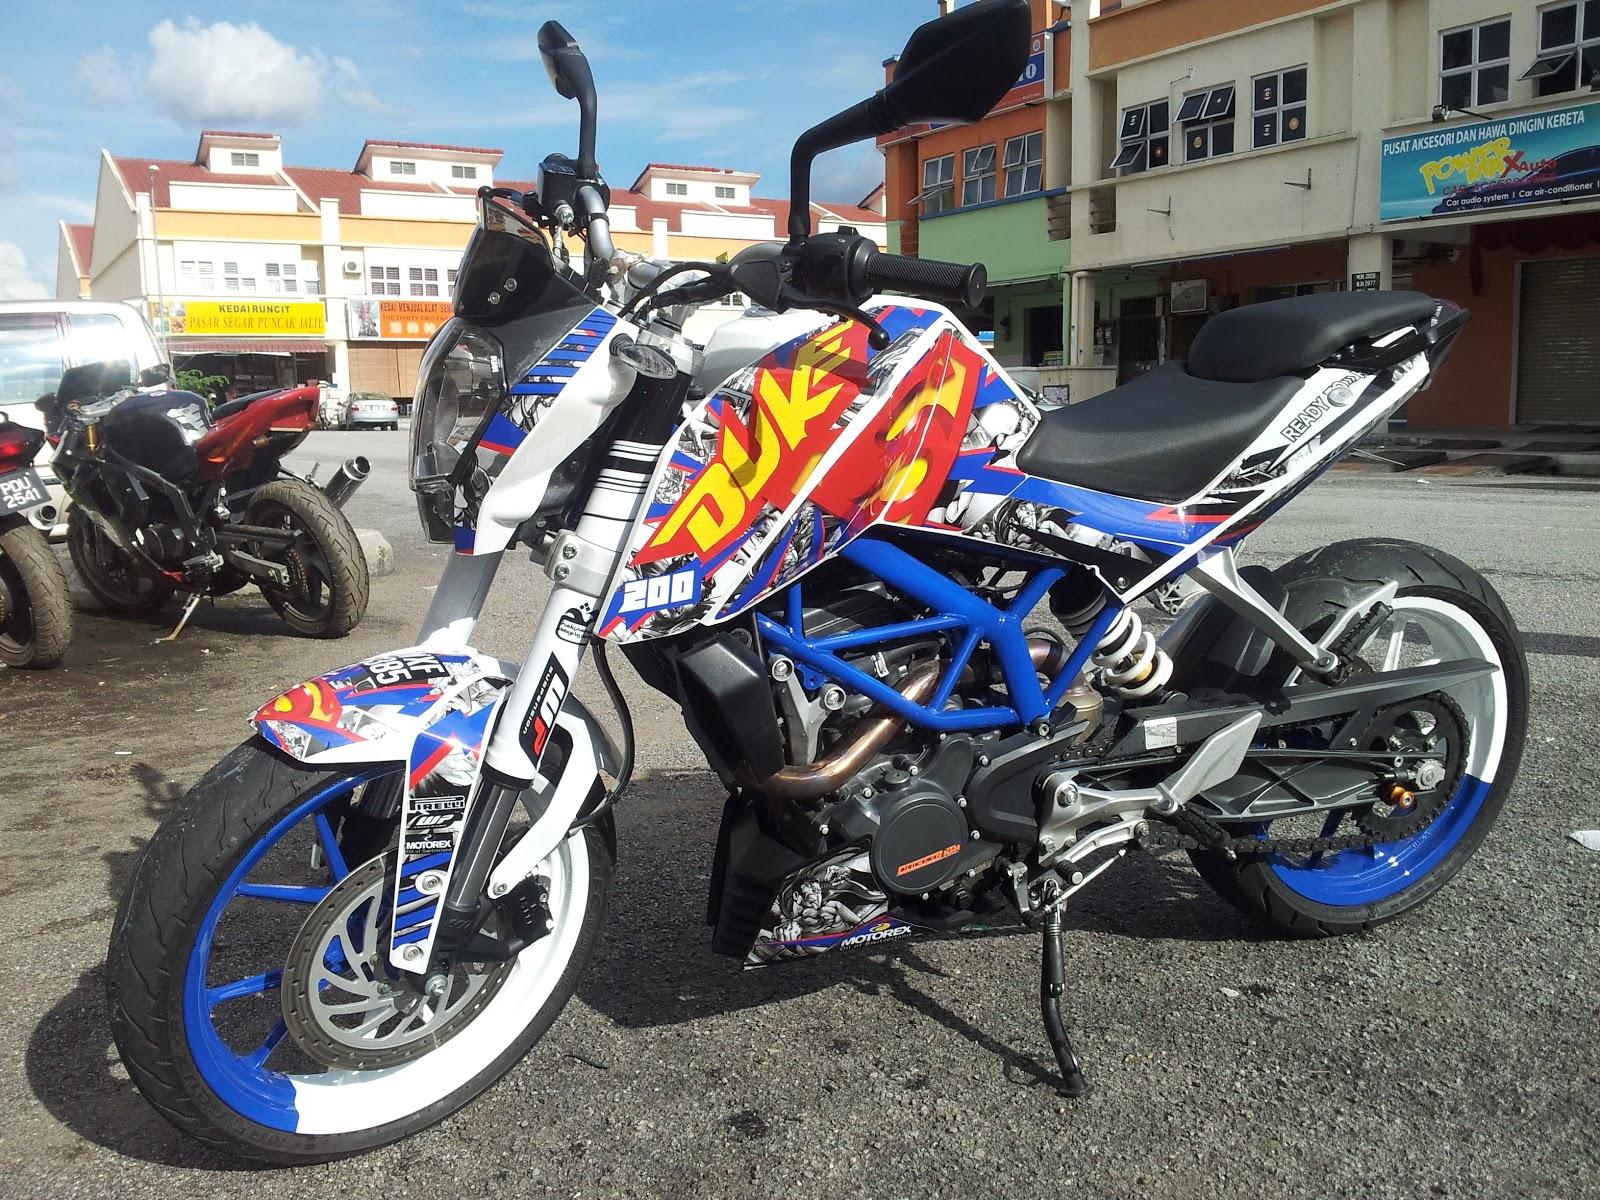 KTM Duke Modified